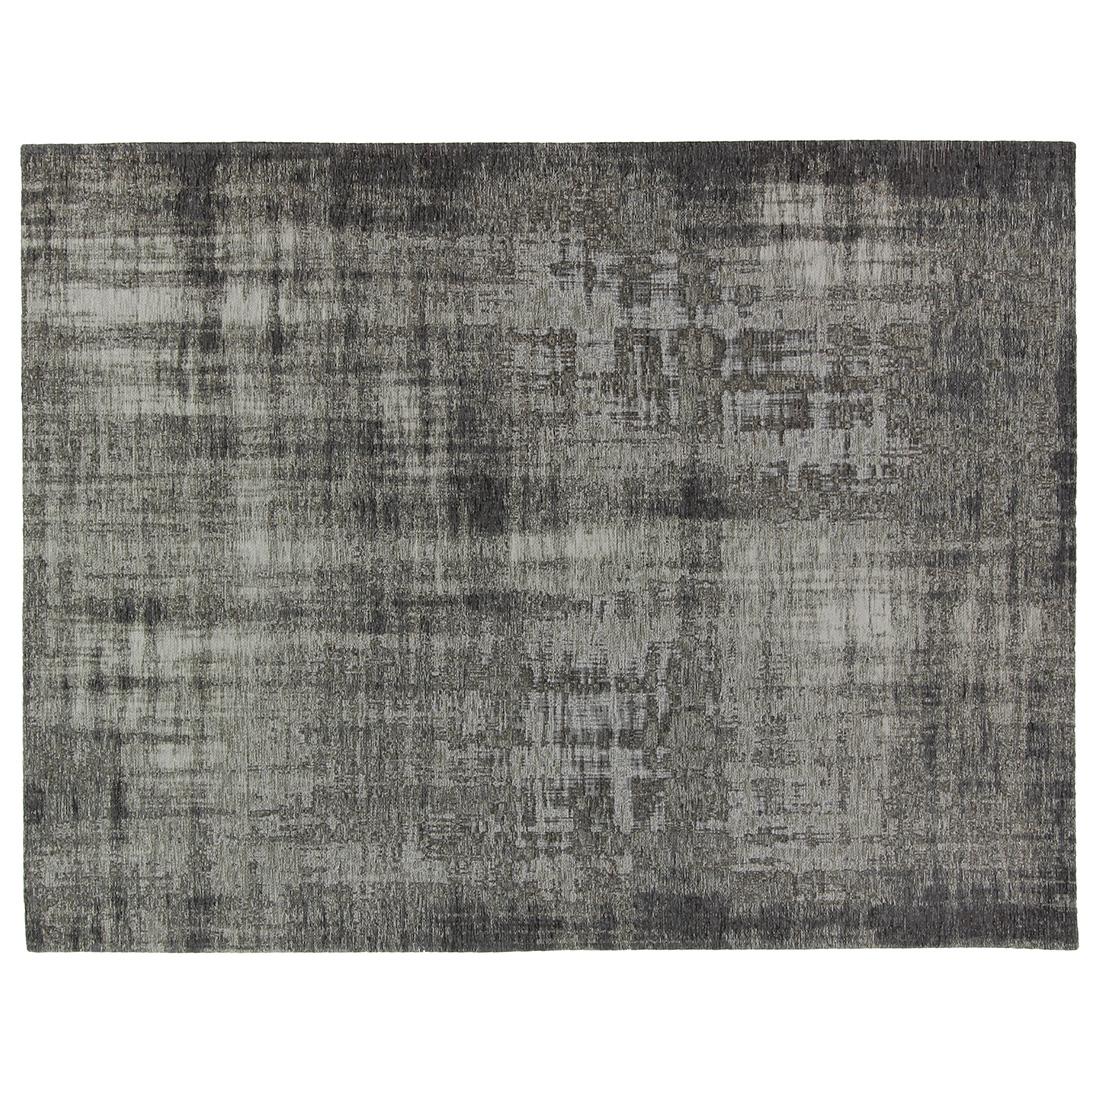 Vloerkleed Brinker Grunge Metallic | 240 x 340 cm